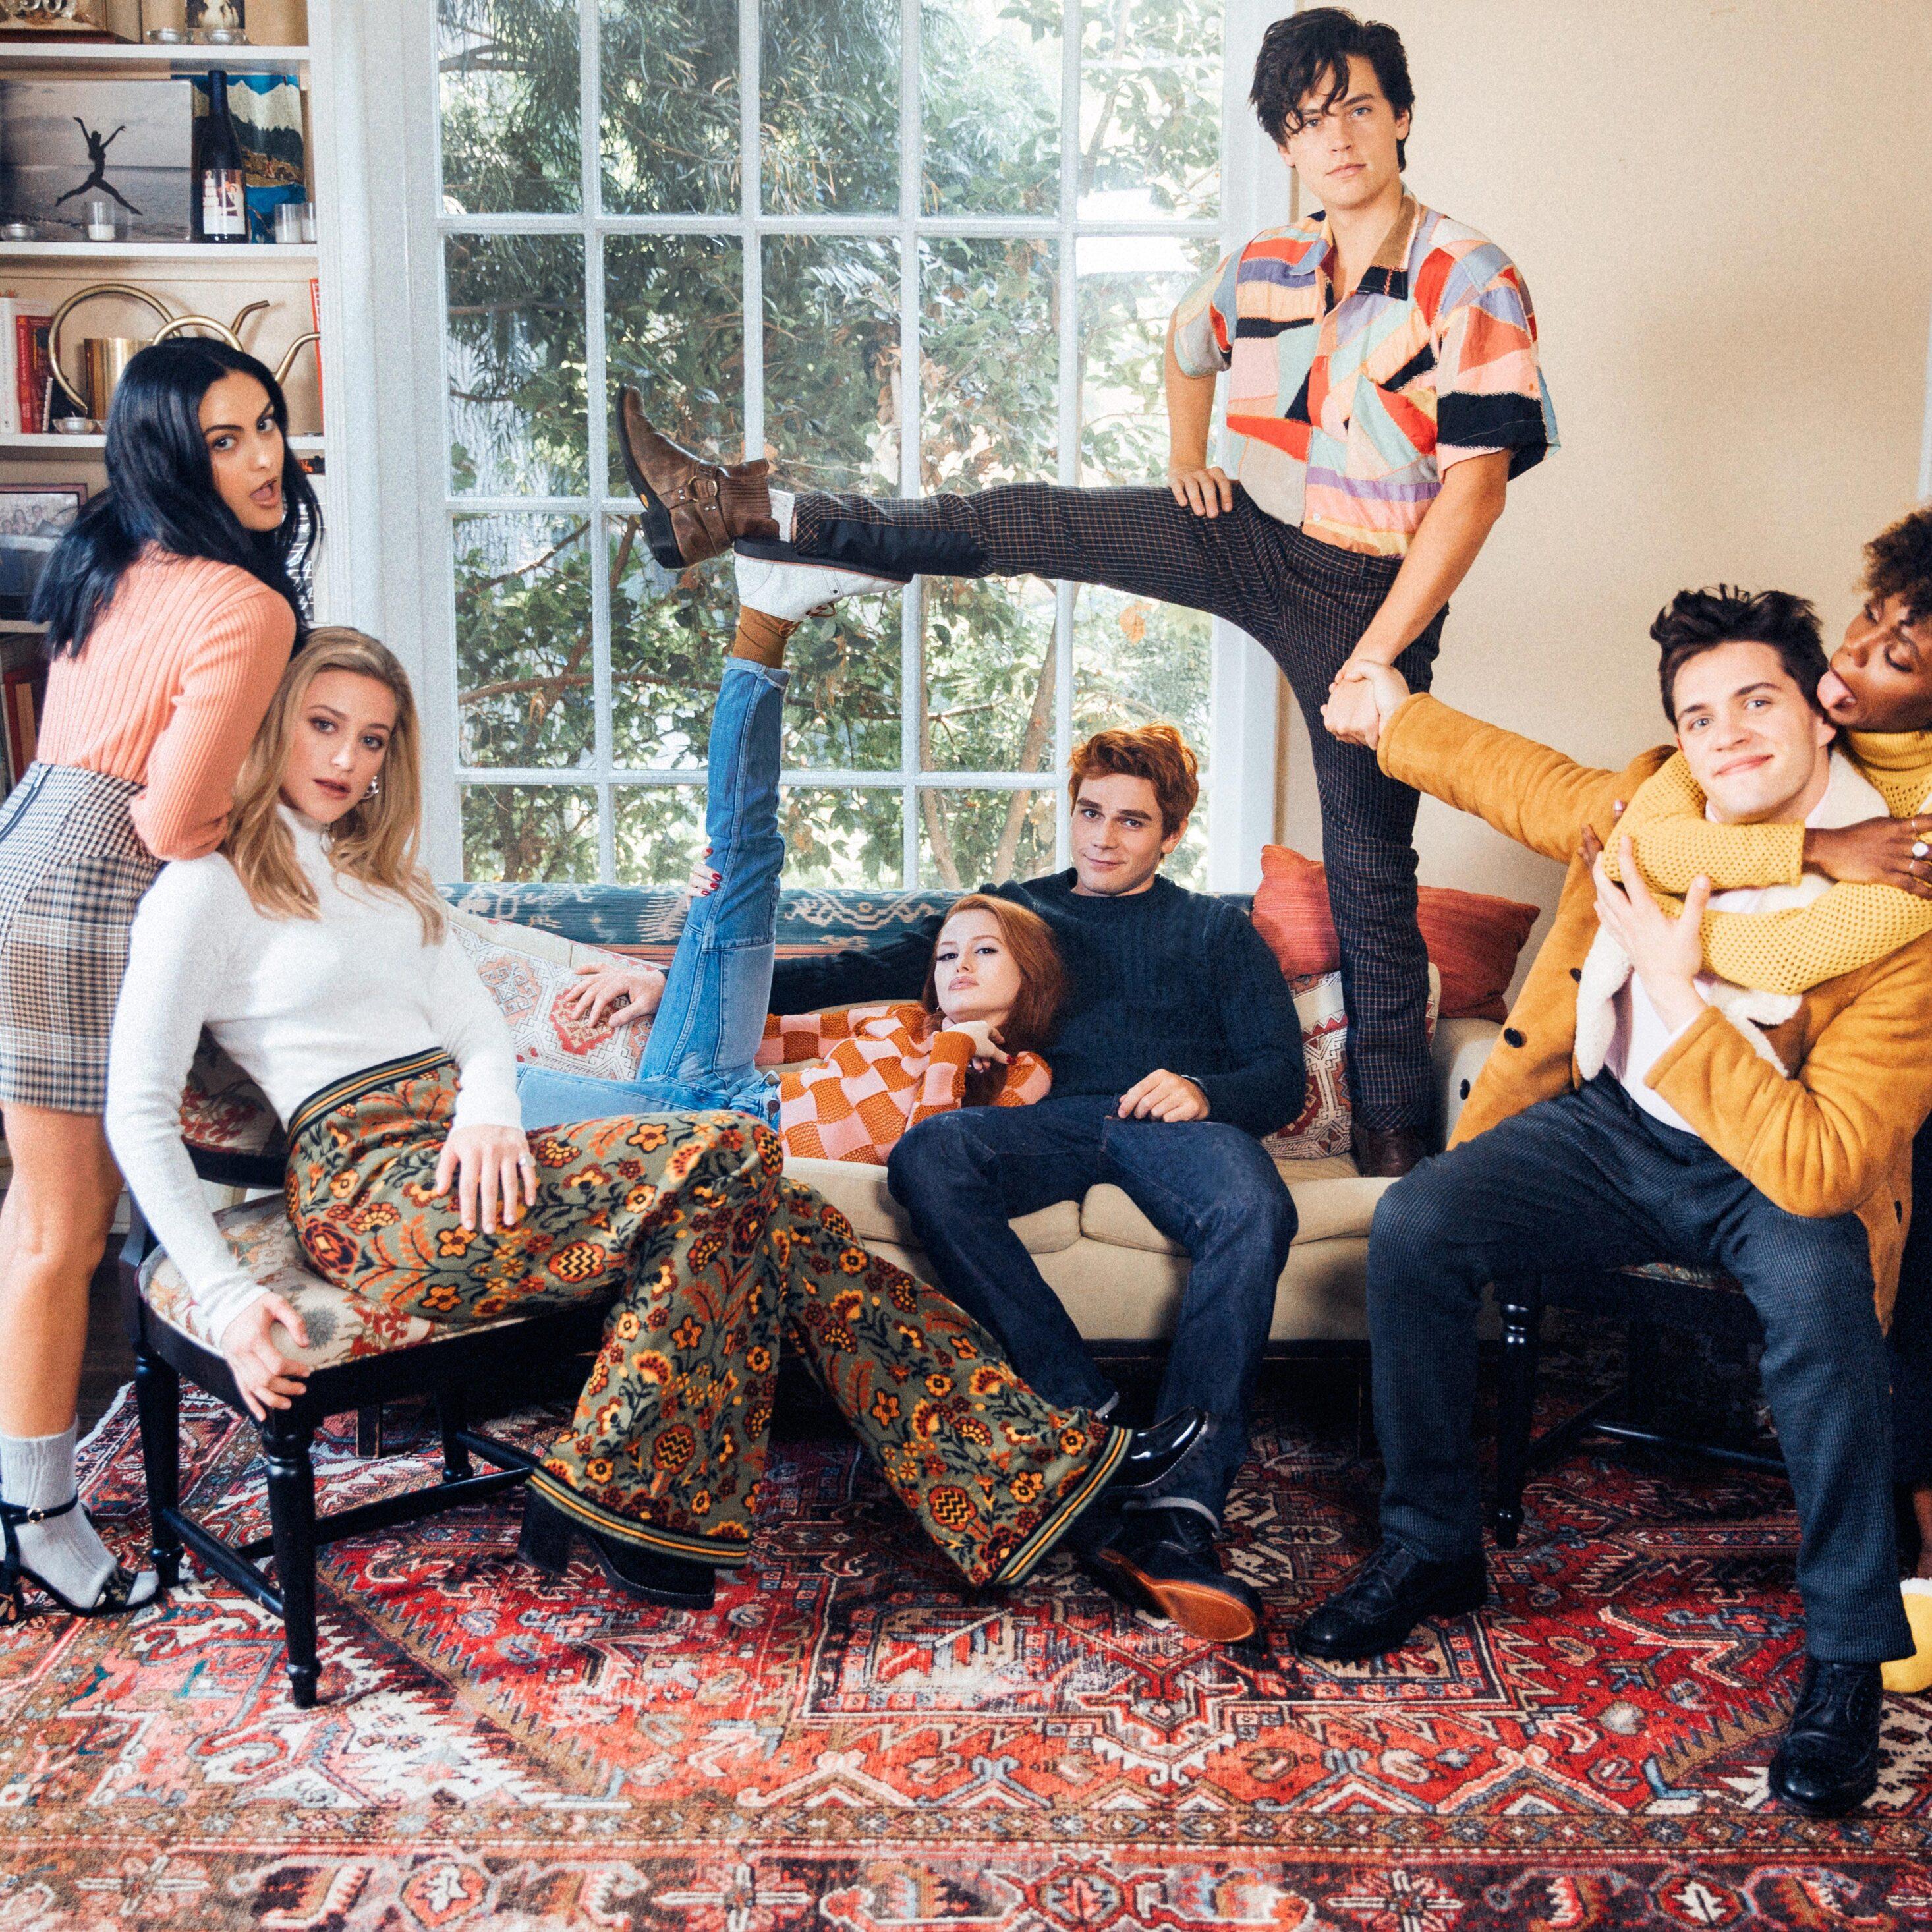 Anime In Netflix India: 2932x2932 Riverdale Season 2 Cast Photoshoot 5k Ipad Pro